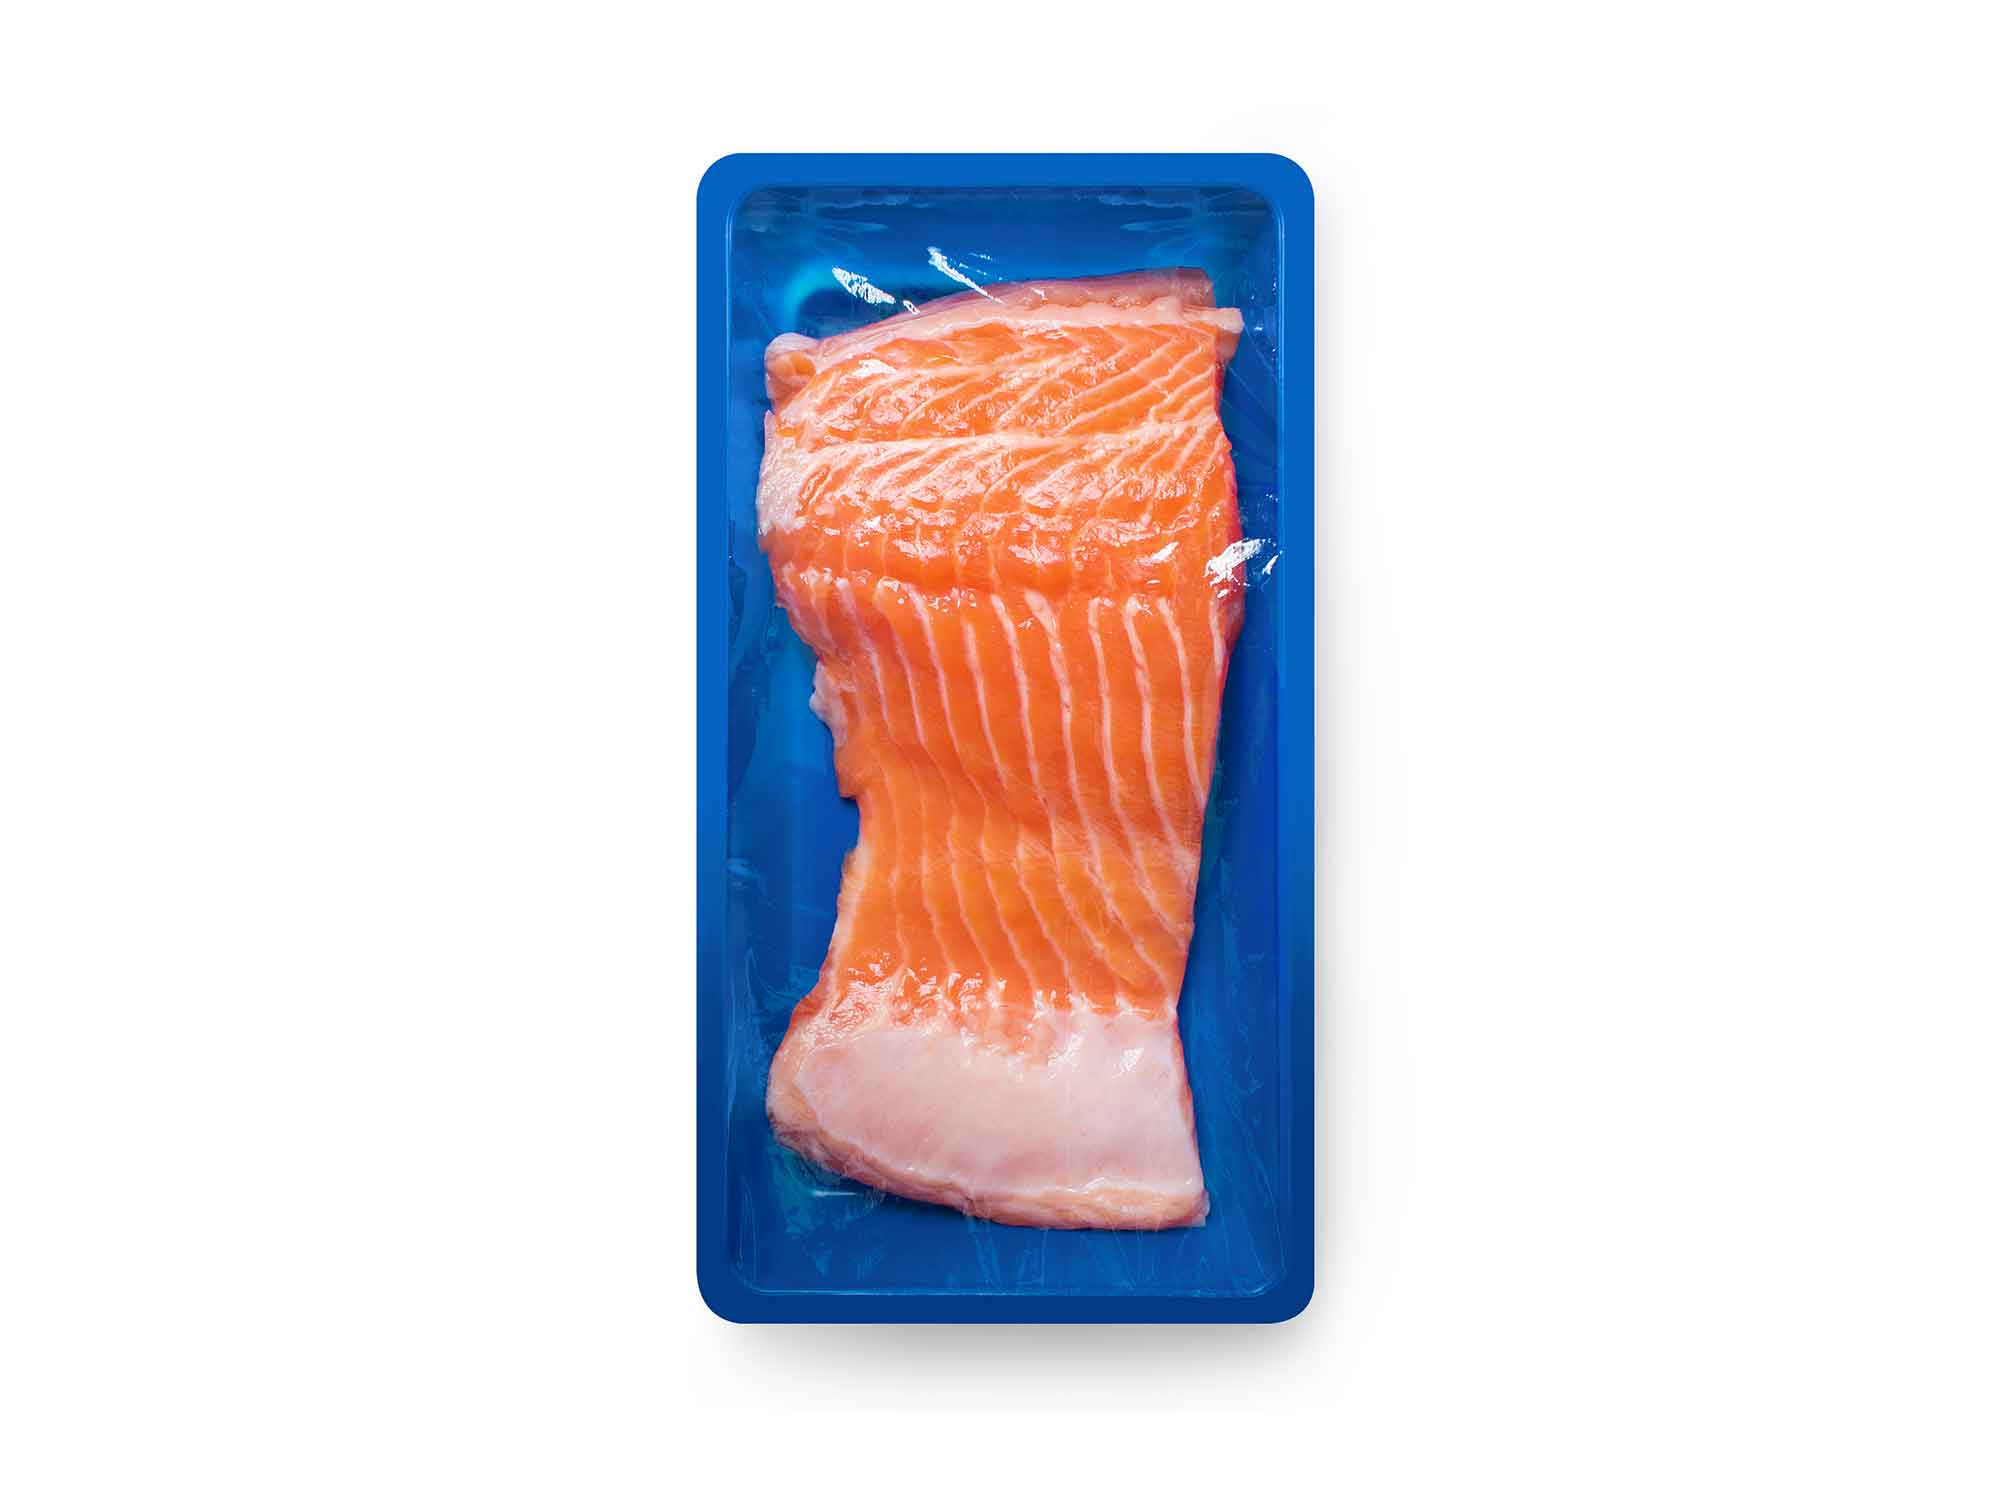 Fish Packaging Mockup 2